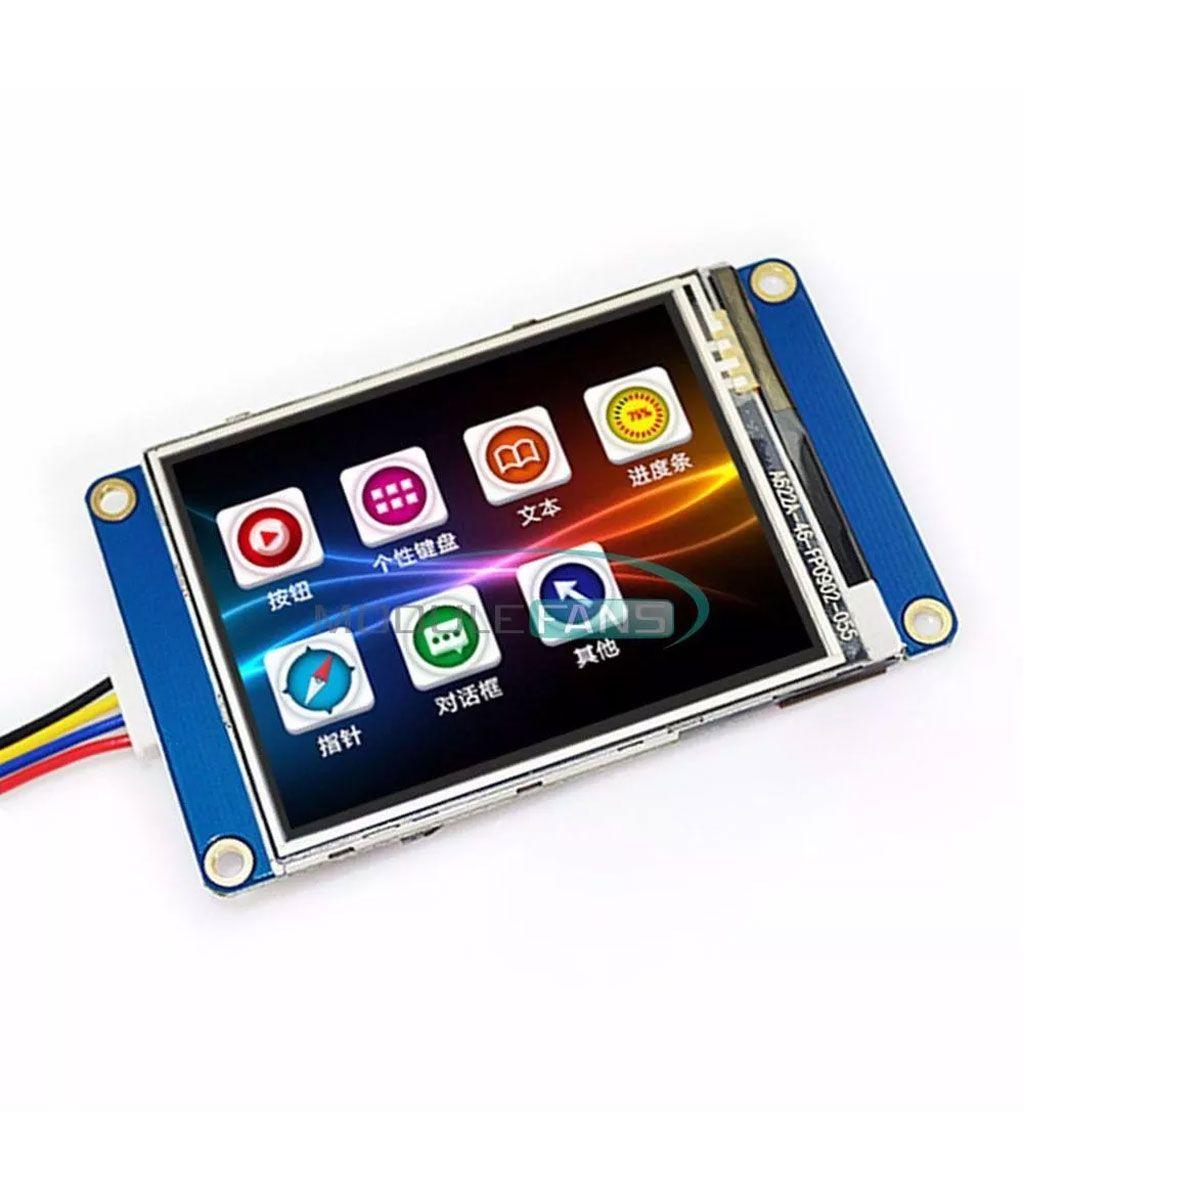 Tela LCD Nextion 2.4 TFT Hmi 320x240 Touch Screen